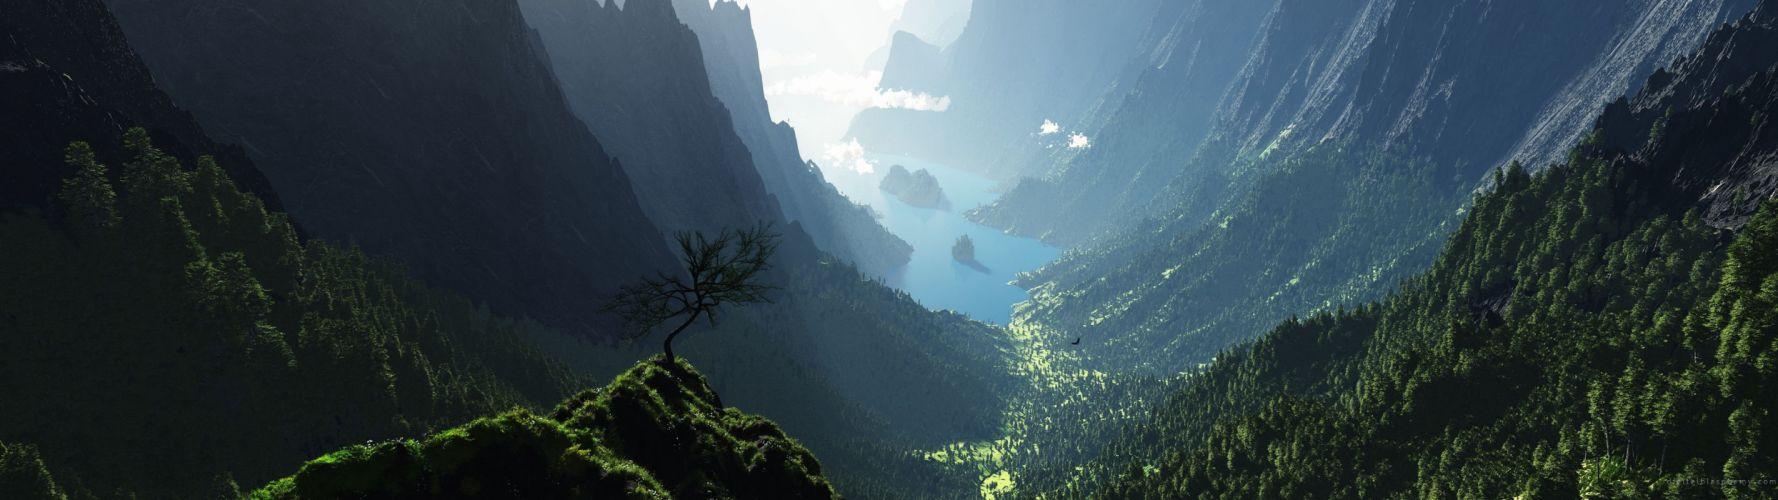 dual monitors mountain lake beauty wallpaper